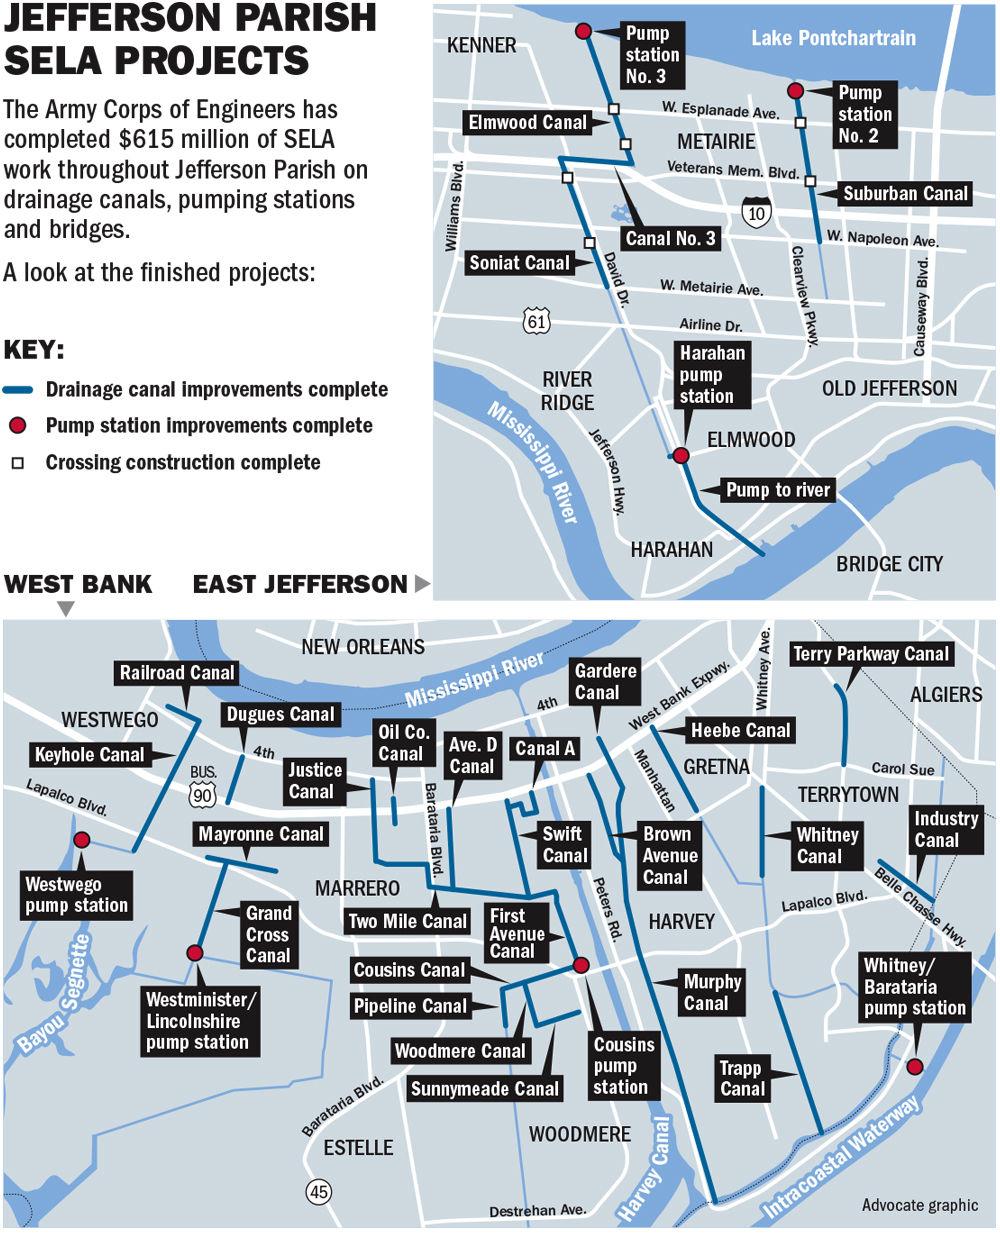 041718 SELA Jefferson canals.jpg